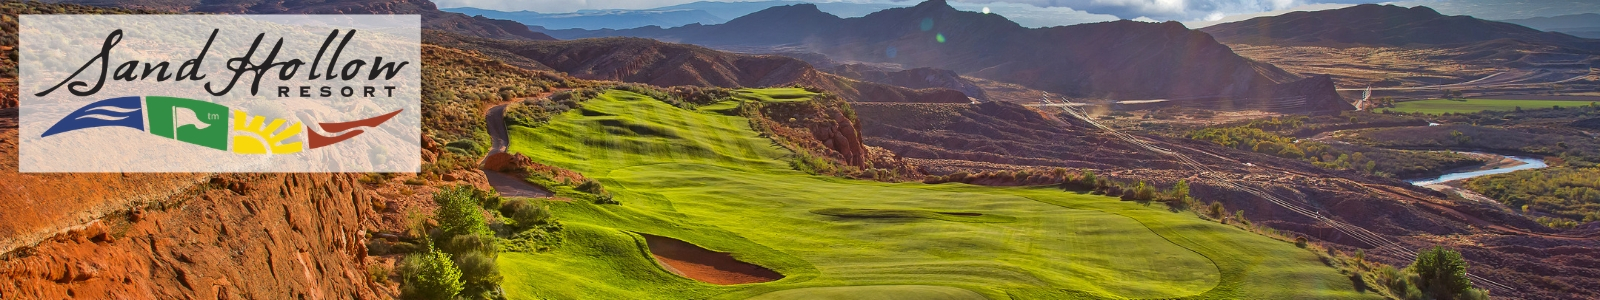 Sand Hollow Golf Resort - St. George, Utah